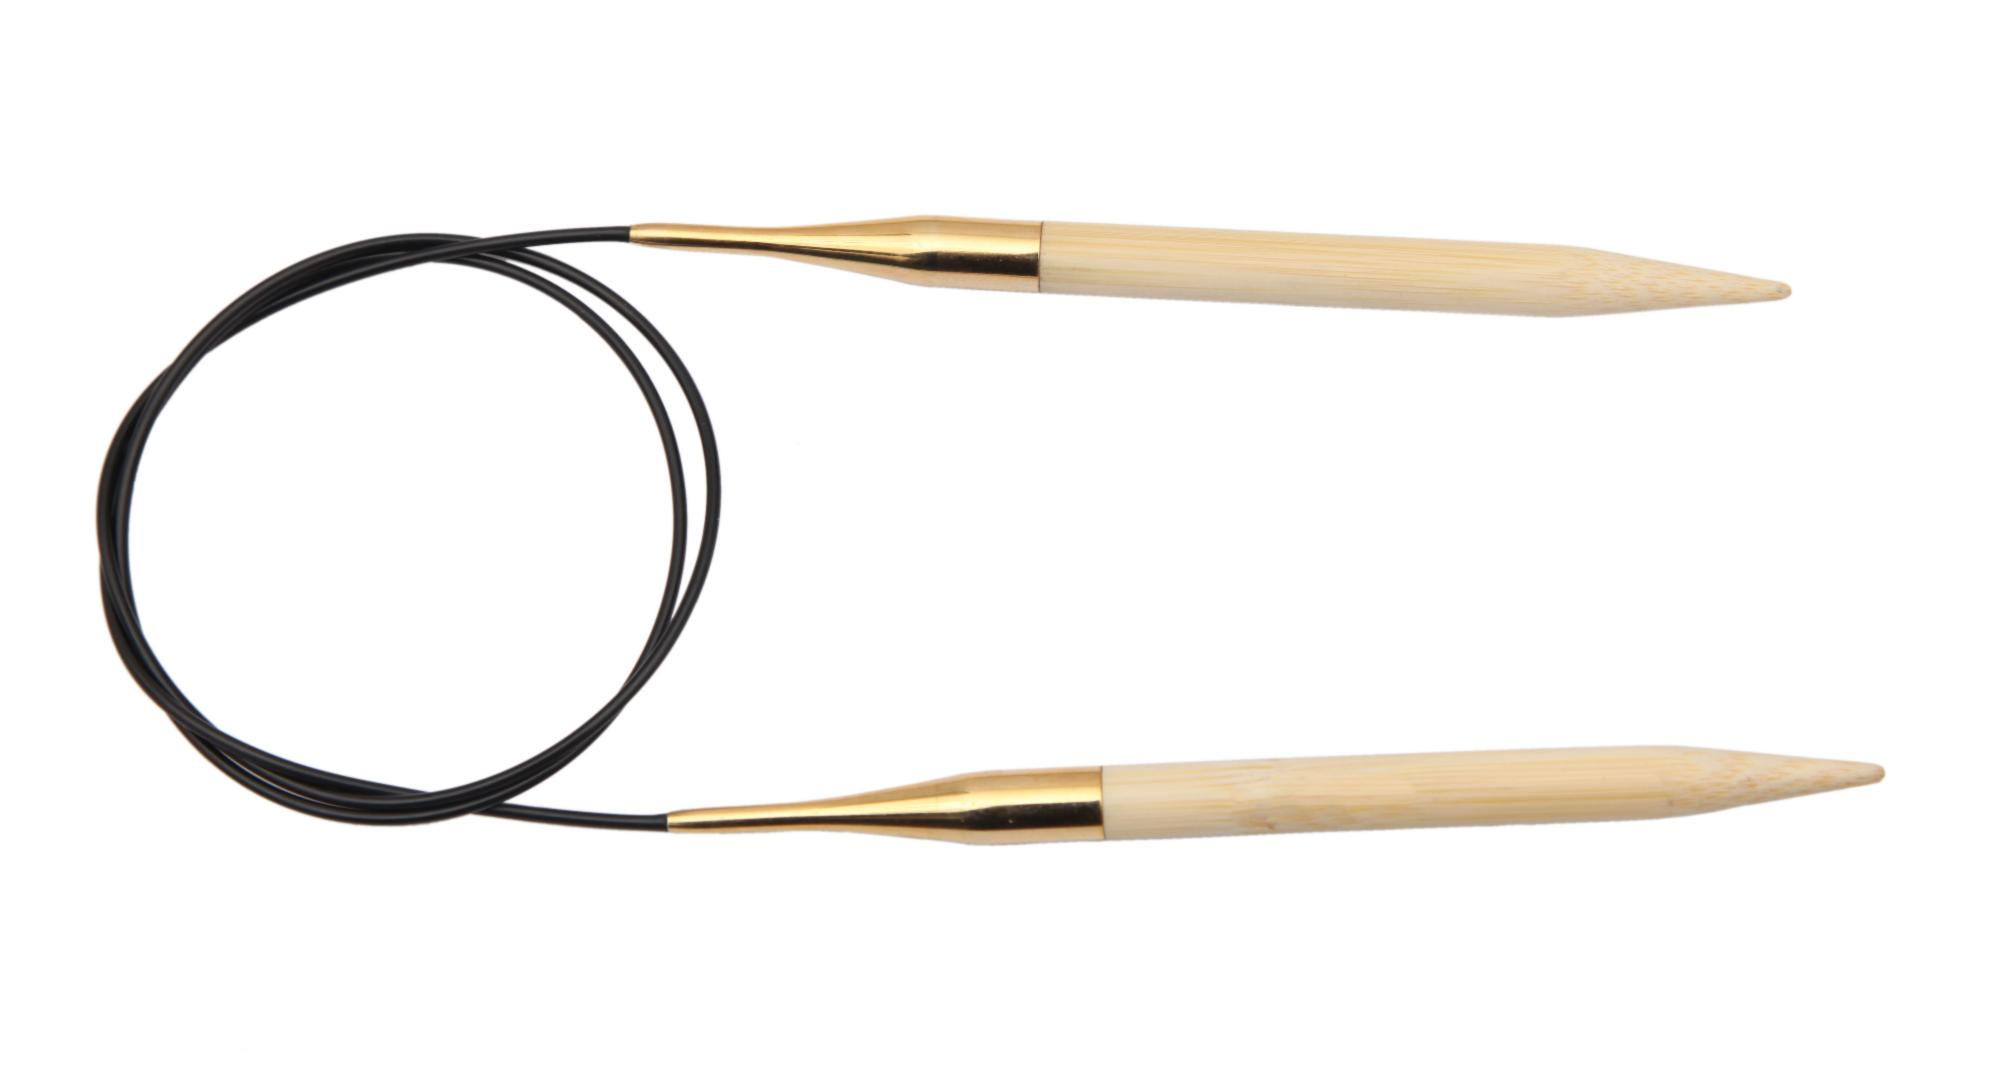 Спицы круговые 100 см Bamboo KnitPro, 22274, 8.00 мм